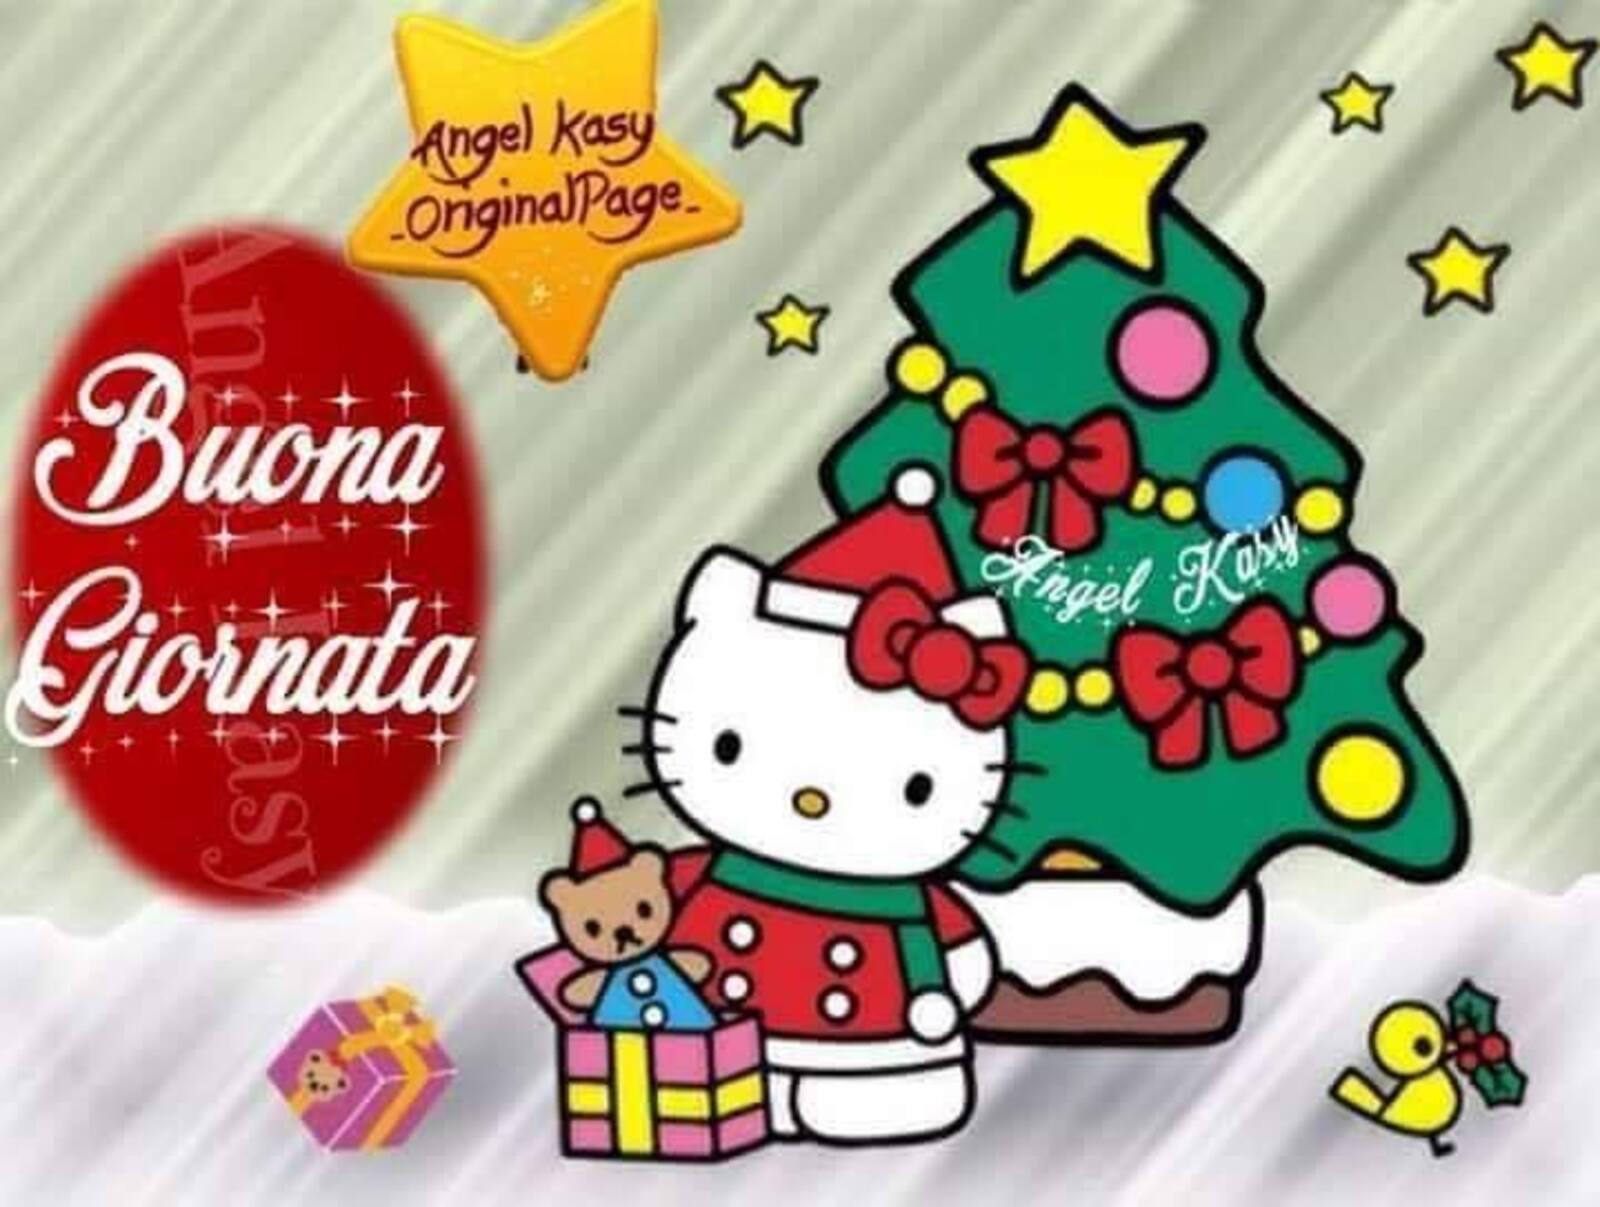 Buona giornata Hello Kitty Natale